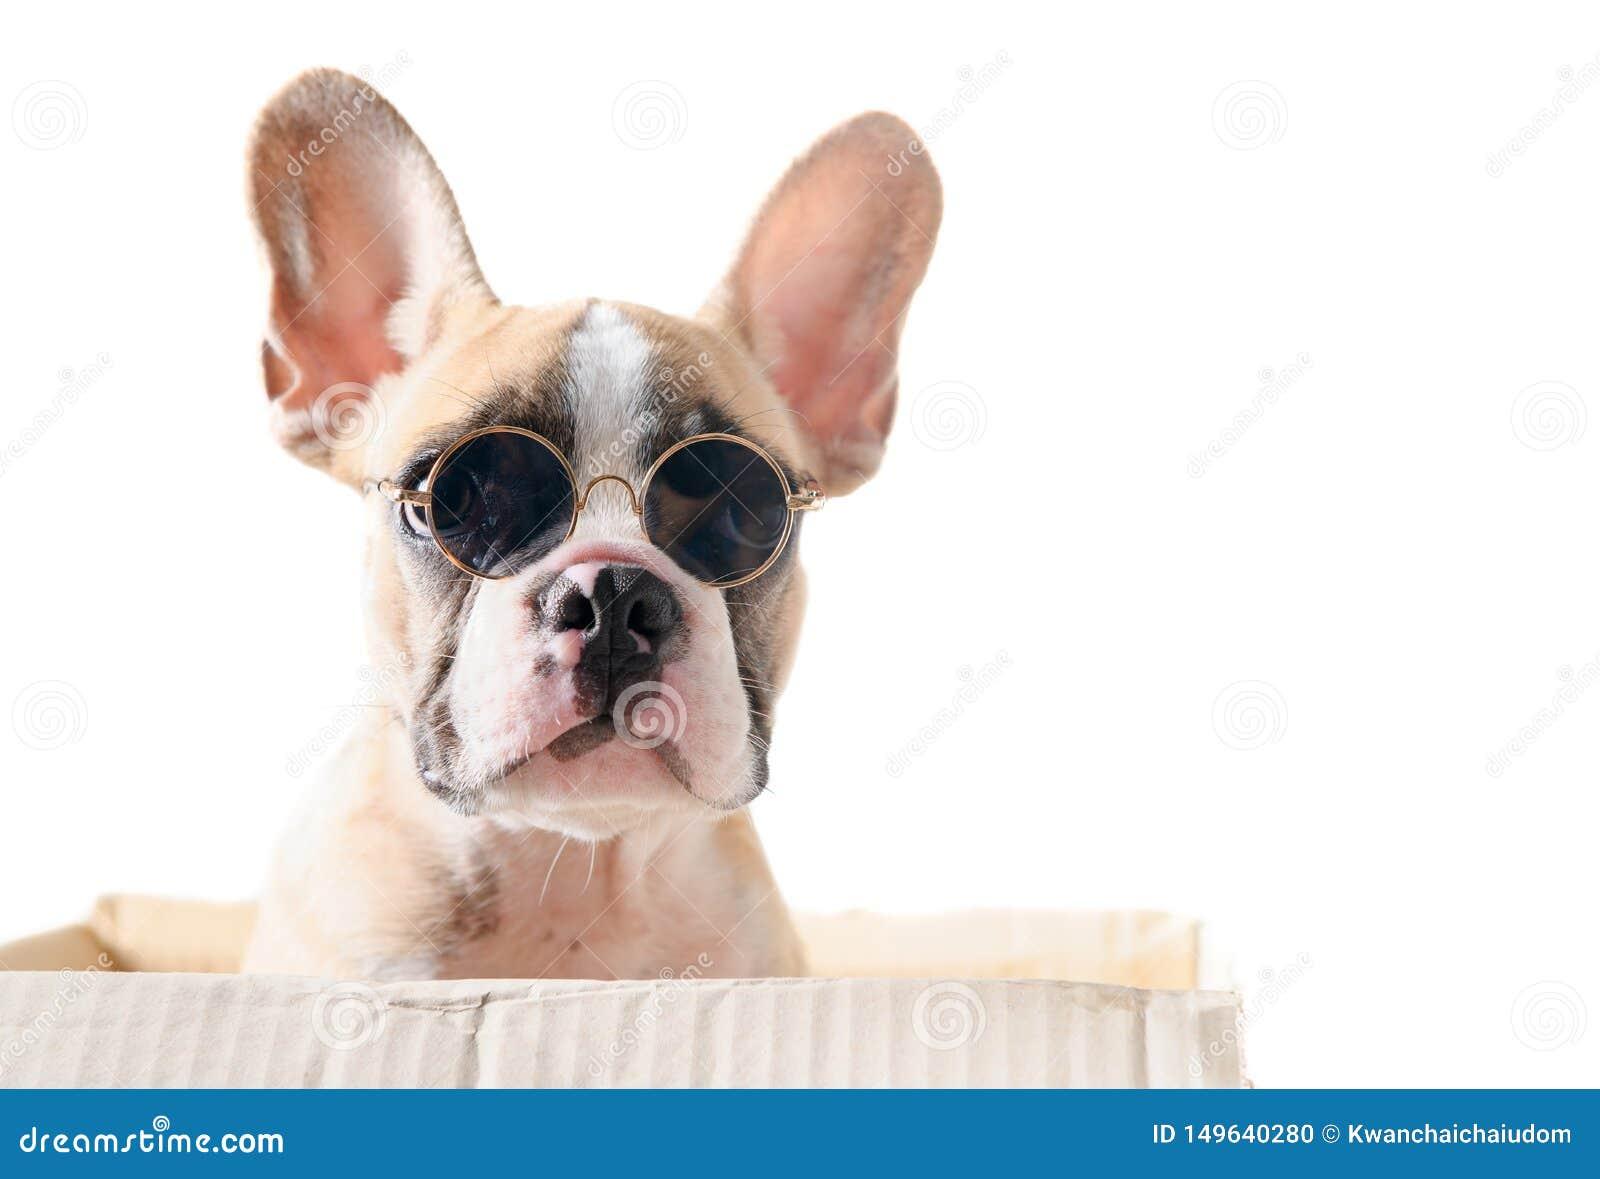 Cute french bulldog wear sunglass in paper box